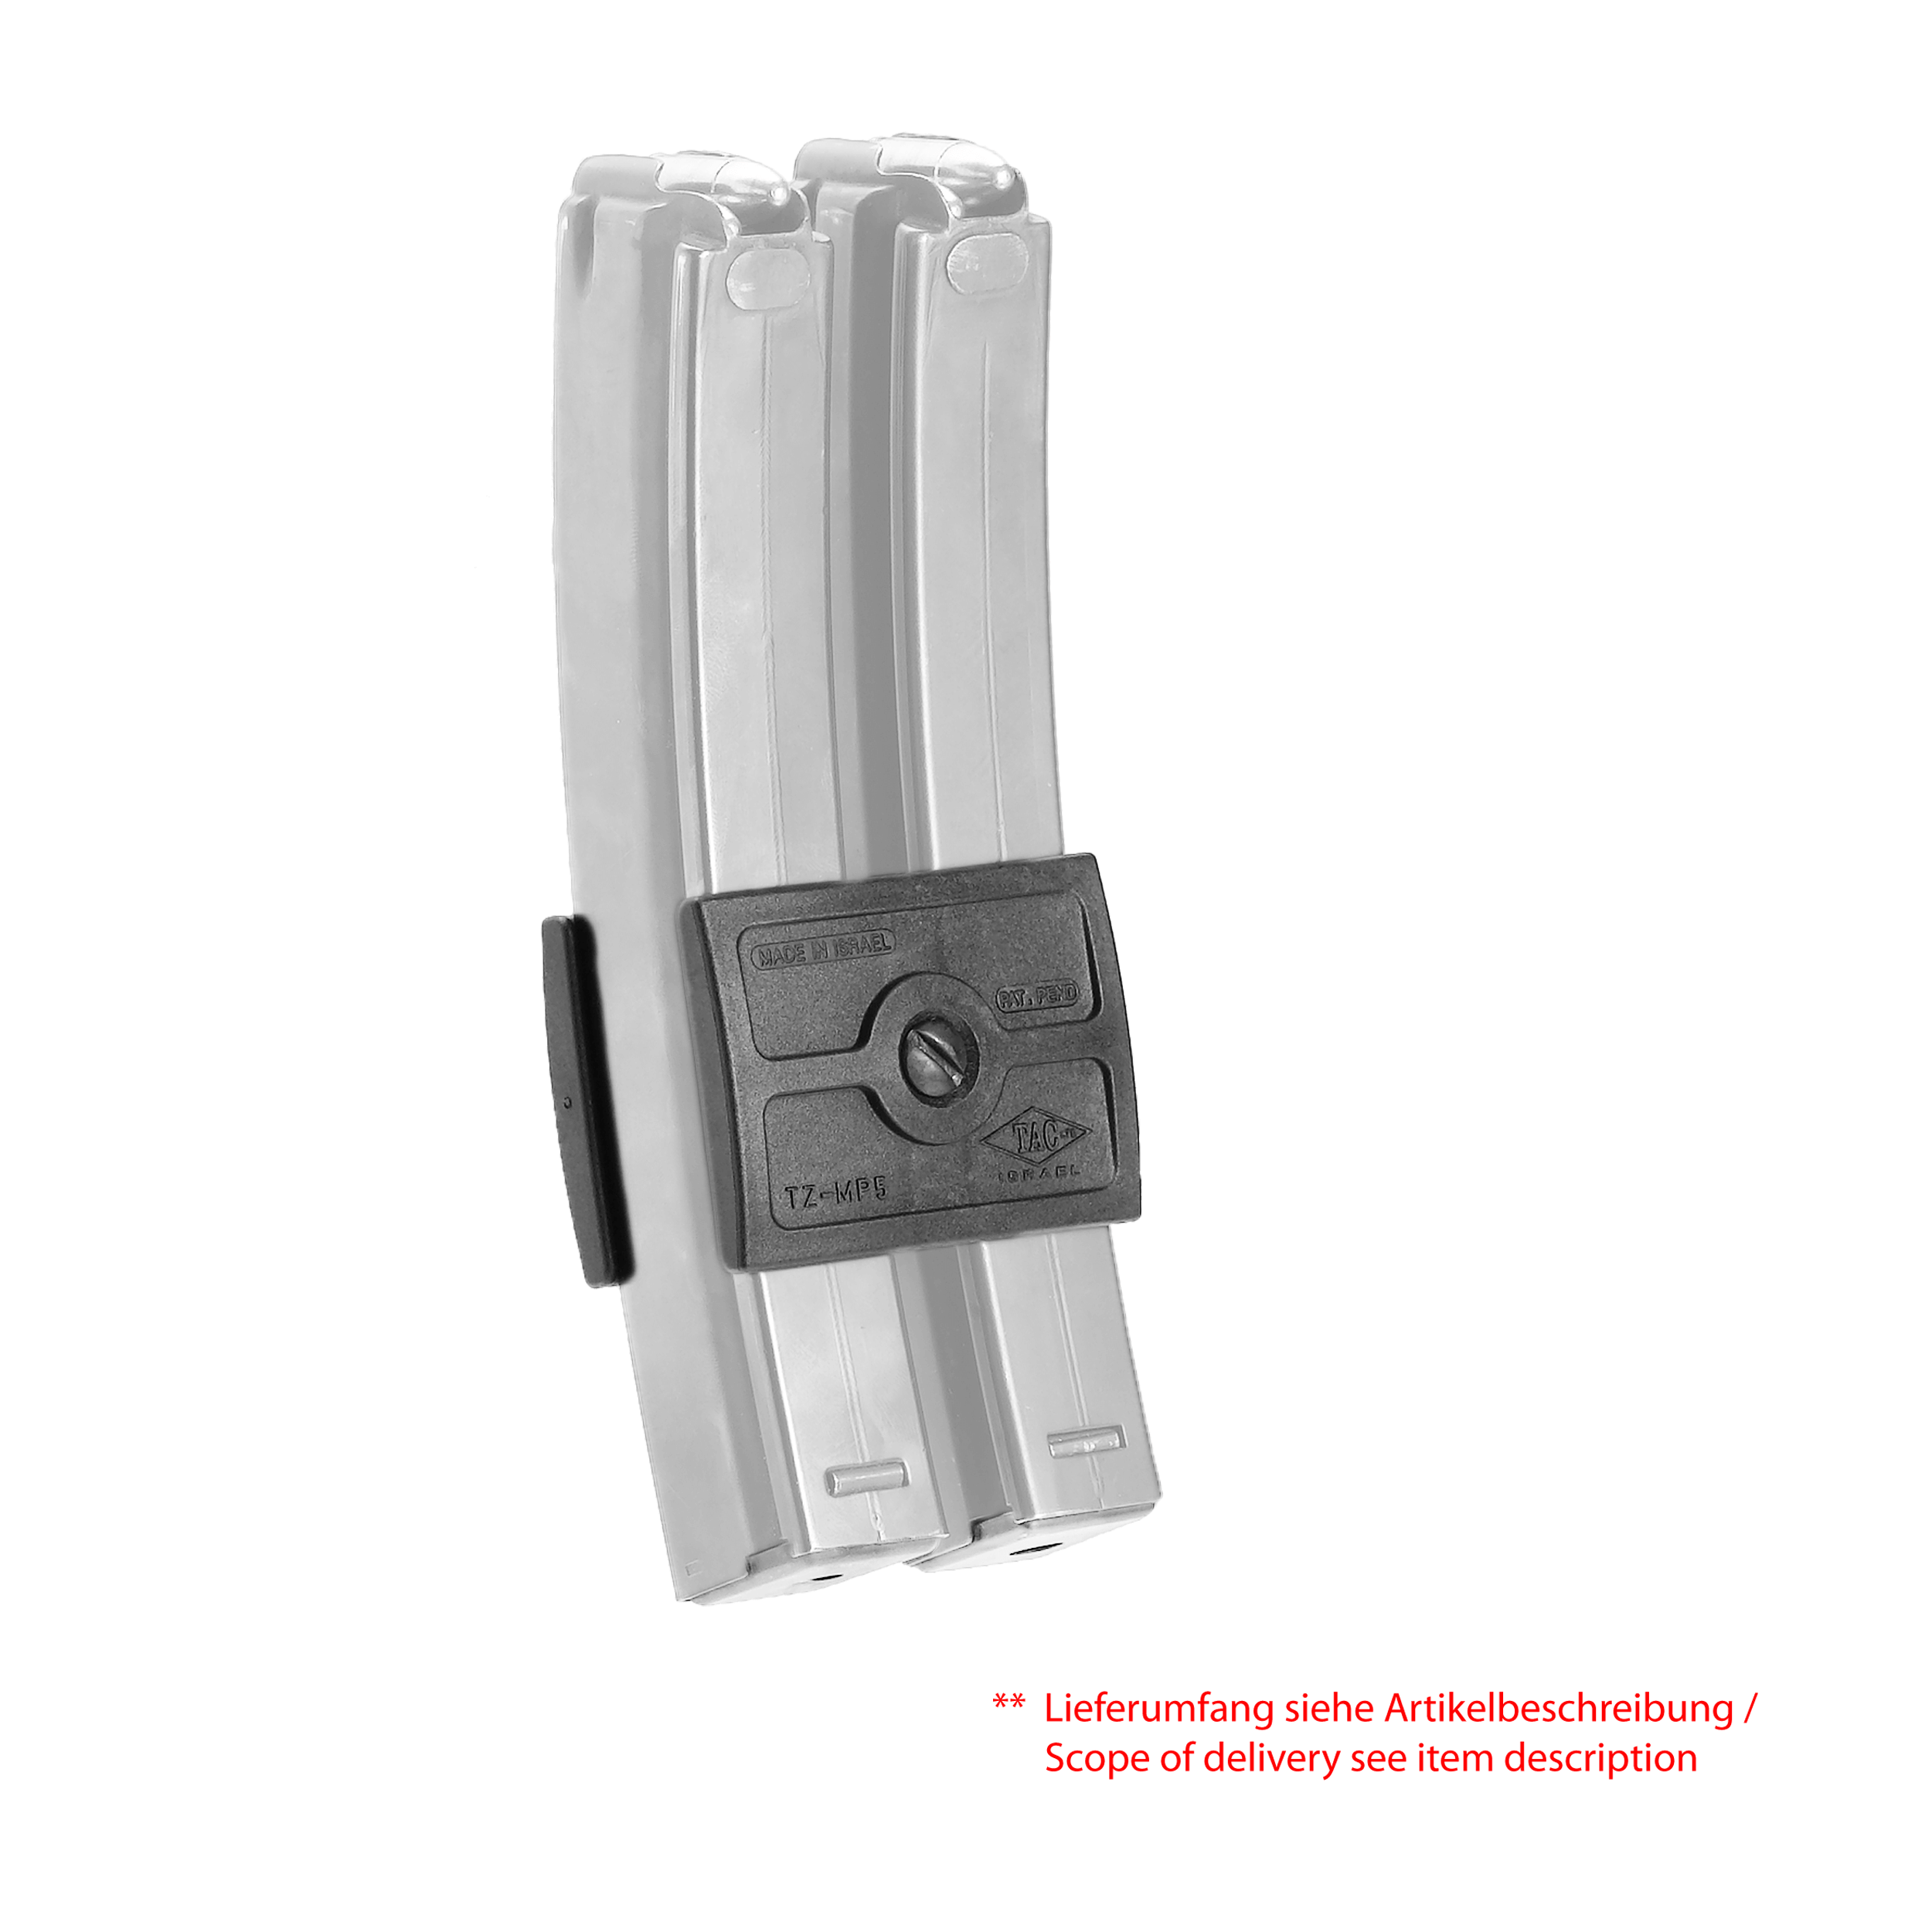 H&K MP5 - GLOCK 9mm Polymer Dual Magazin Clip